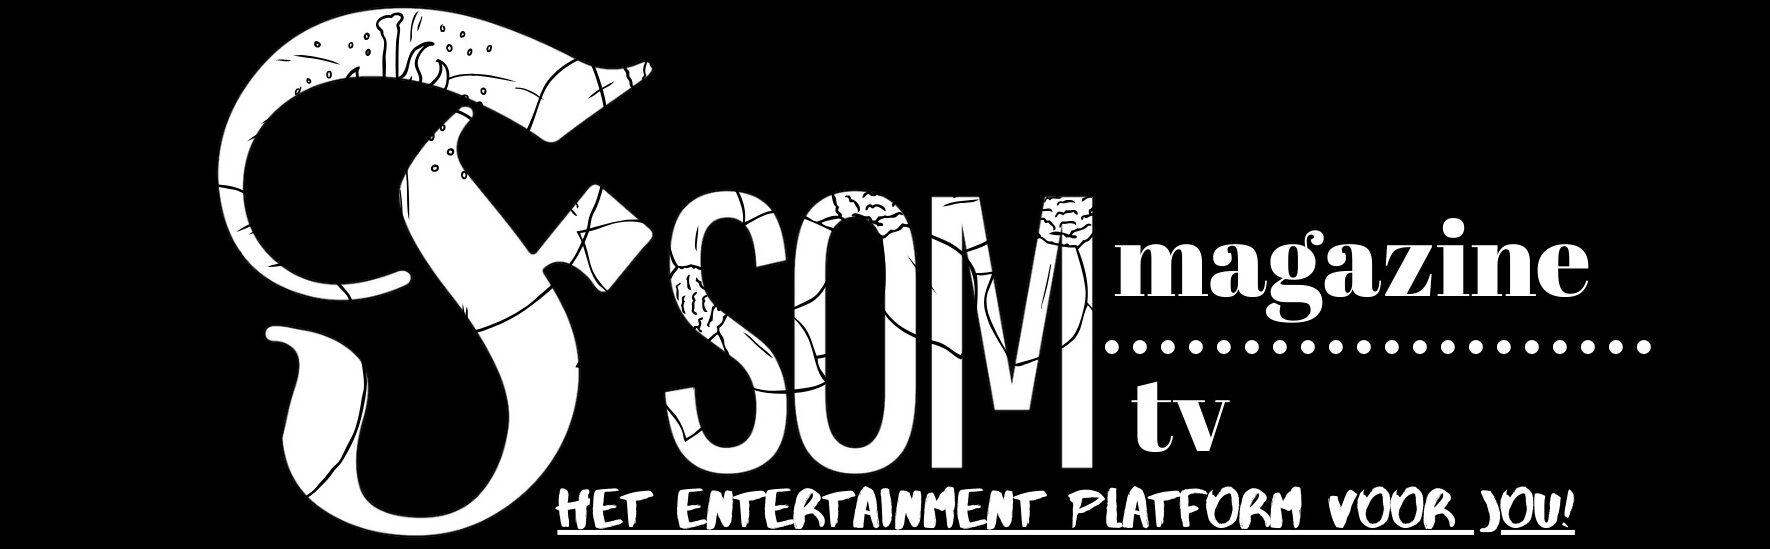 FSOM Magazine. Het entertainment platform voor jou!